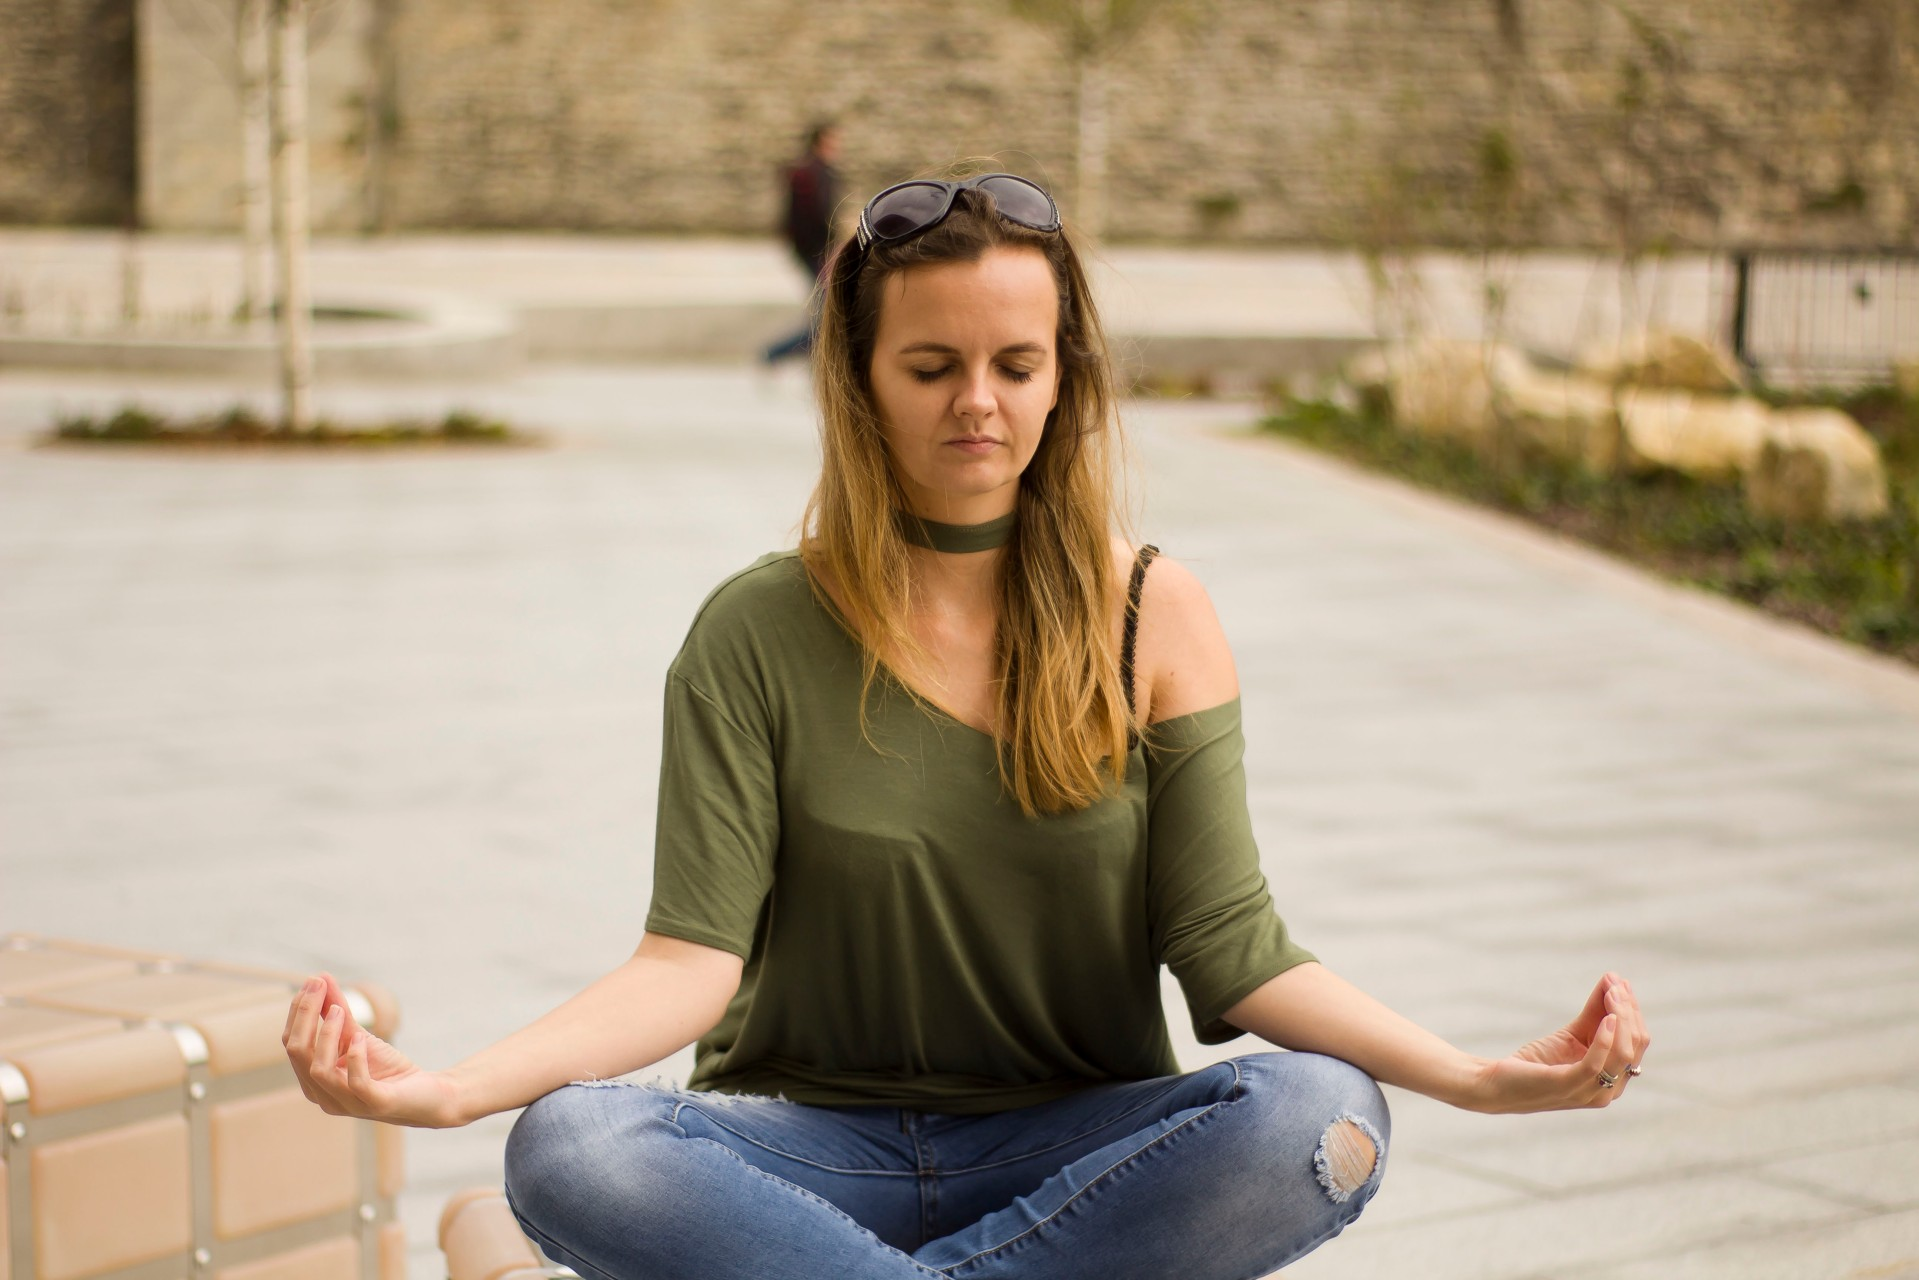 I meditate because I have a temper